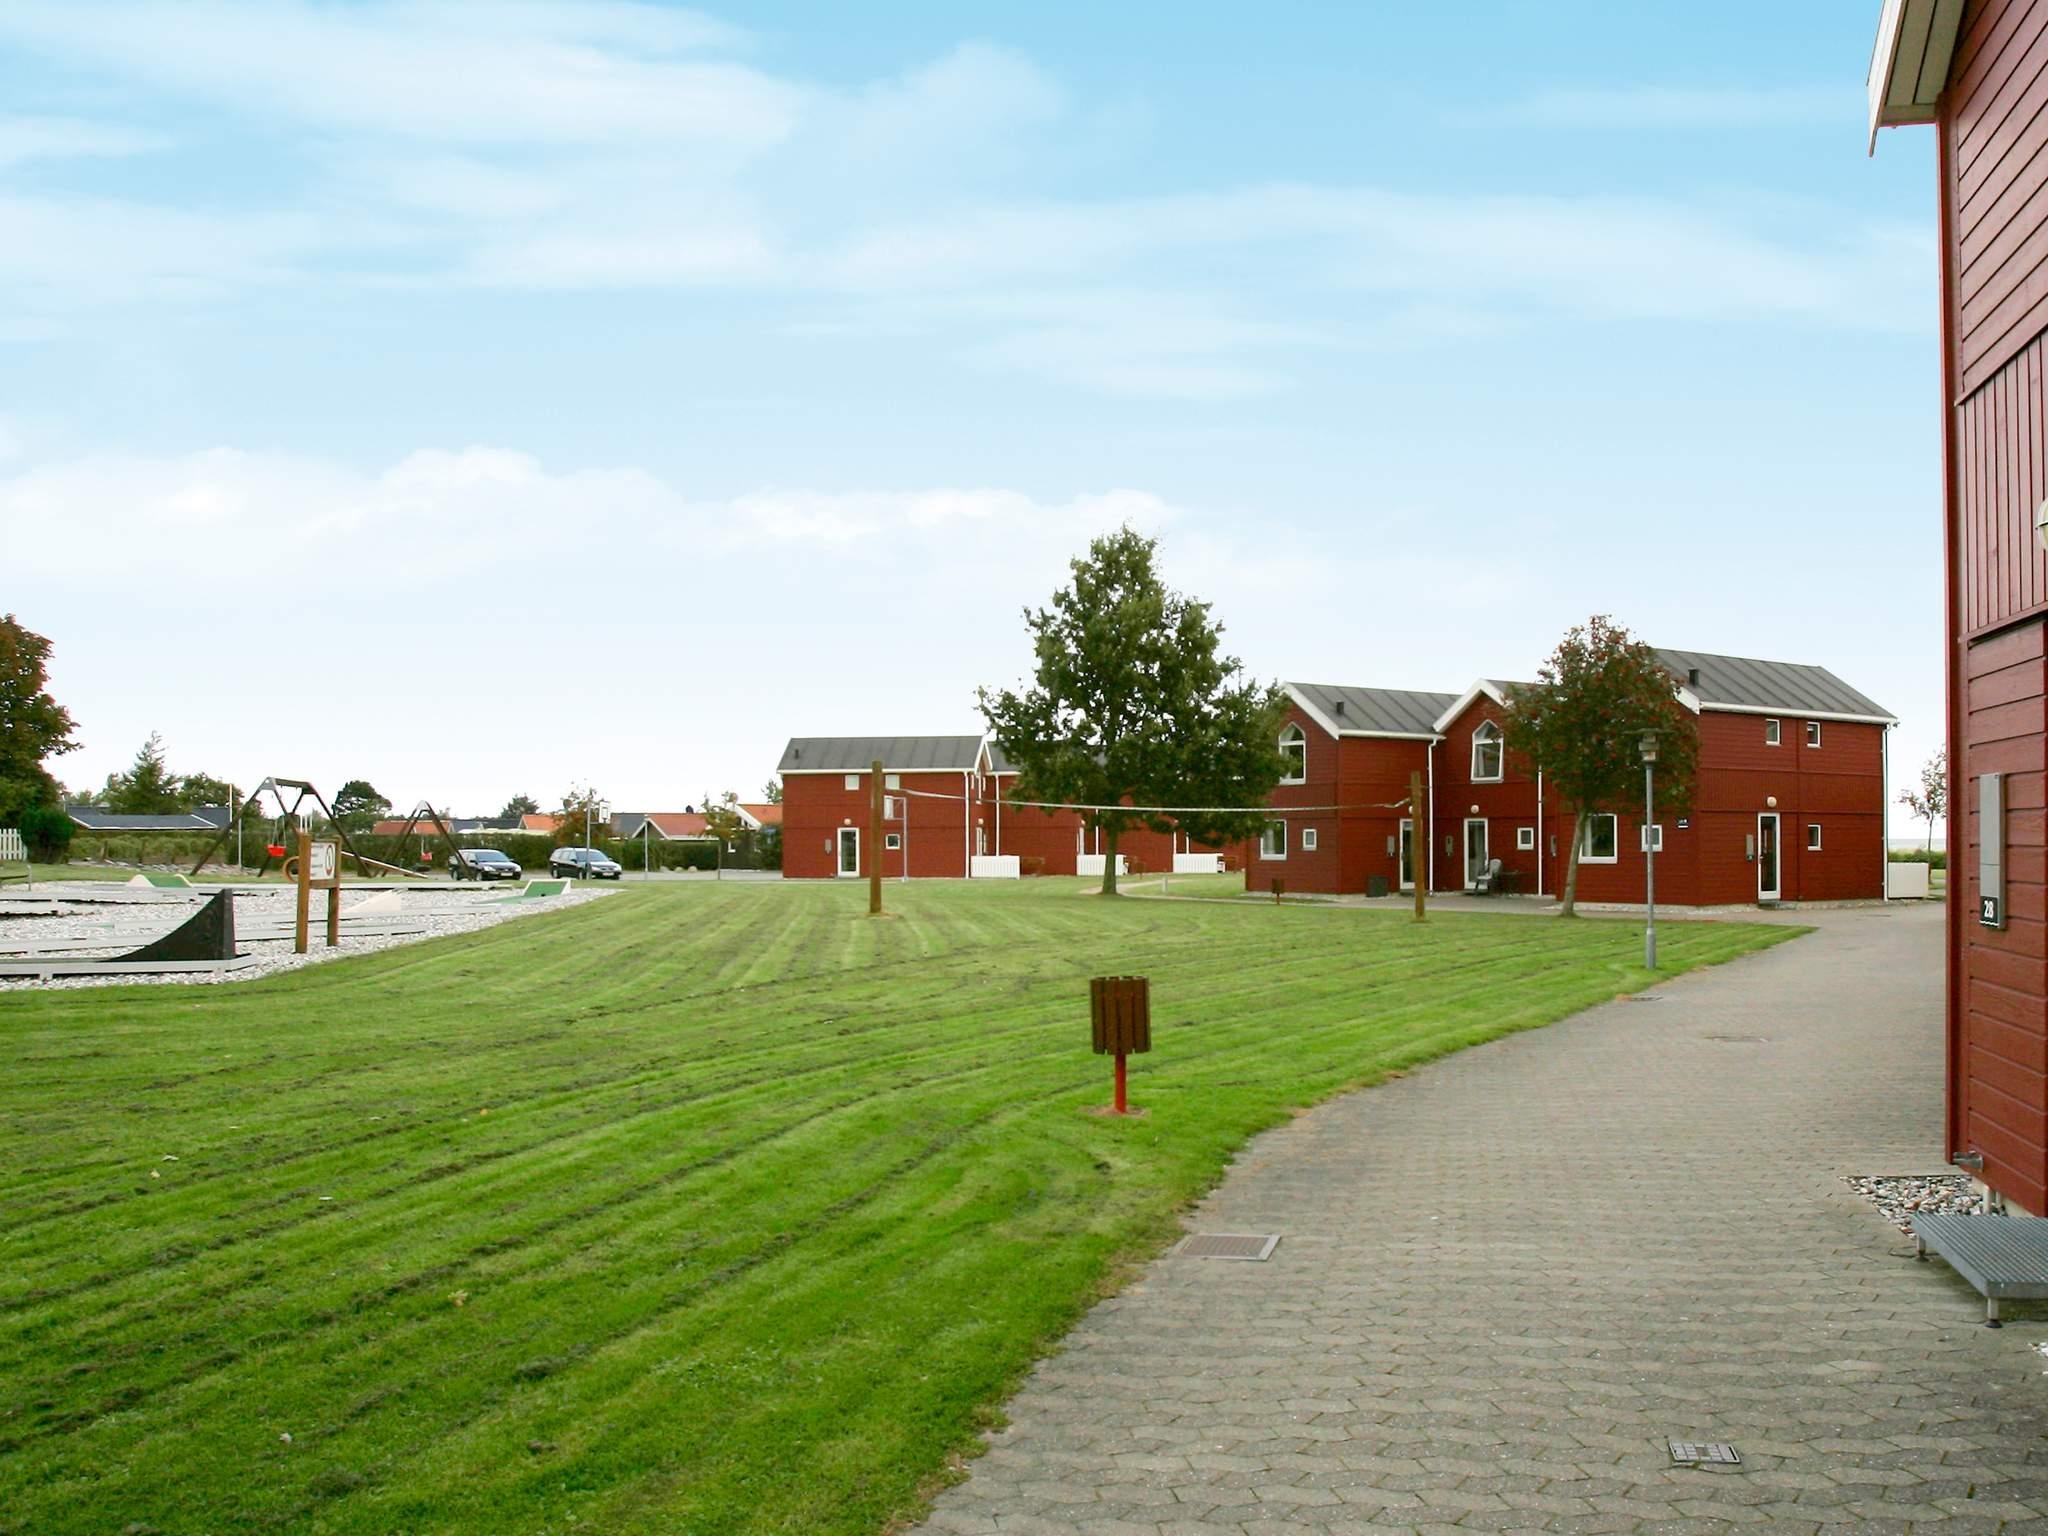 Ferienwohnung Øster Hurup (377971), Øster Hurup, , Dänische Ostsee, Dänemark, Bild 11